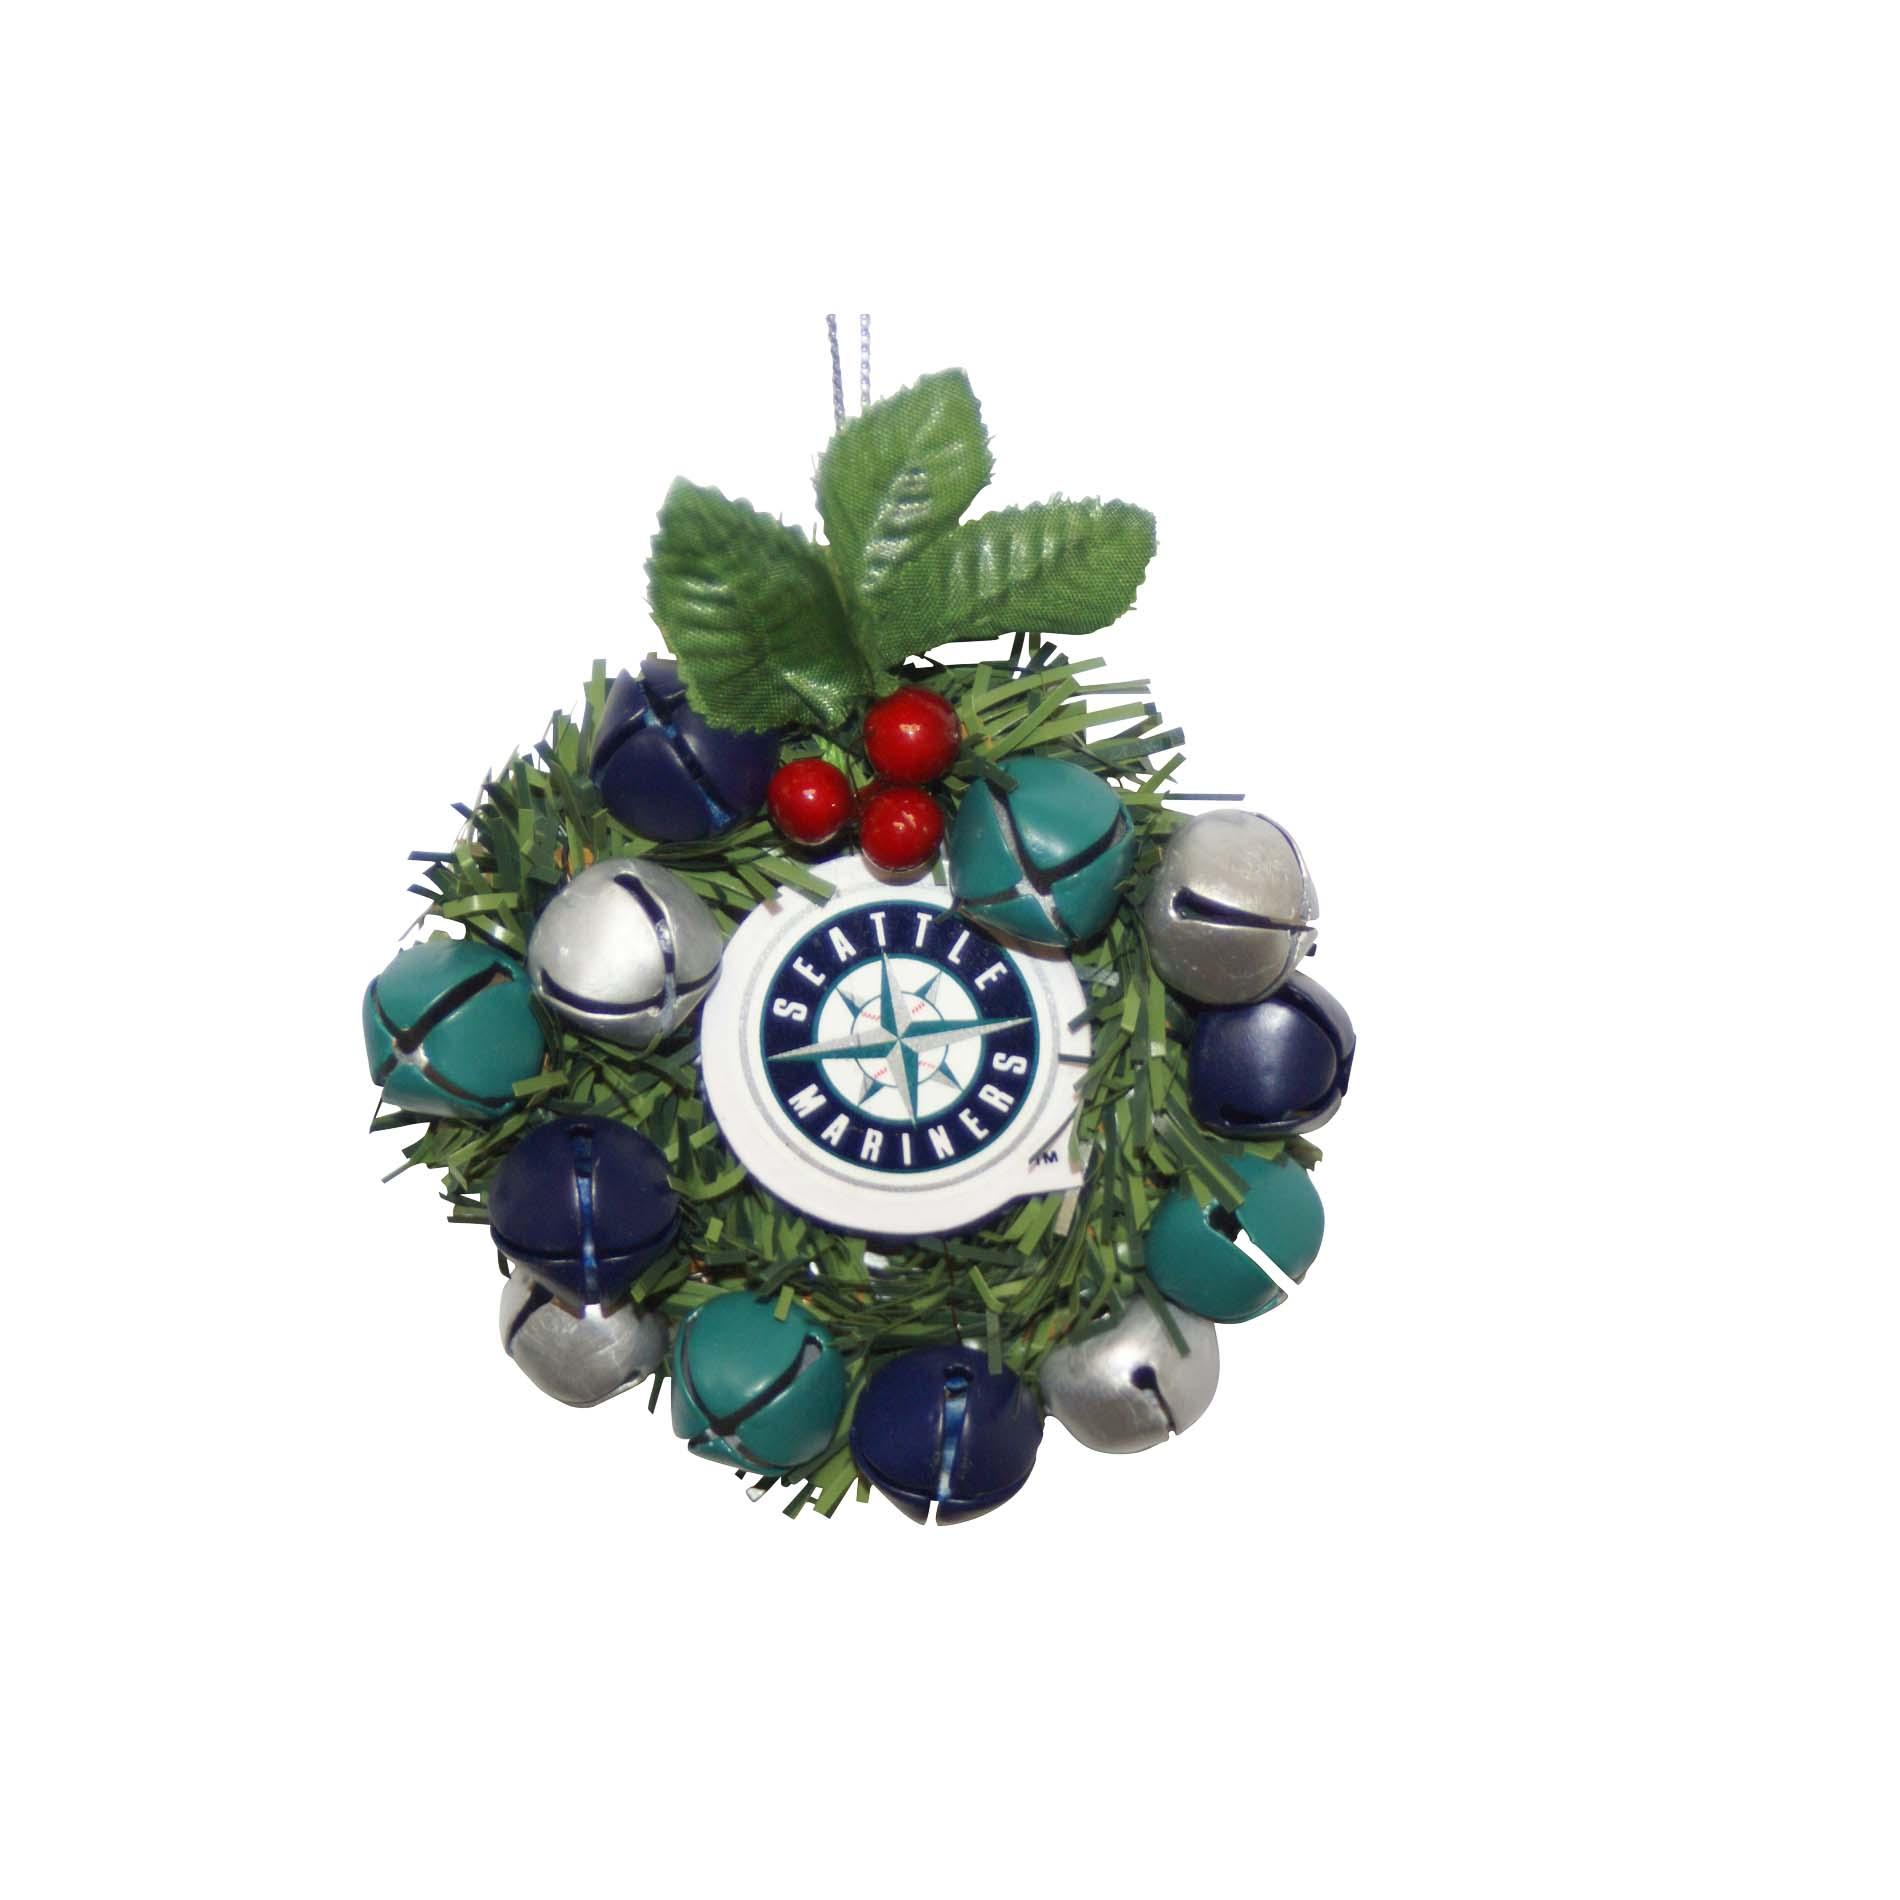 Seattle Mariners Wreath Ornament